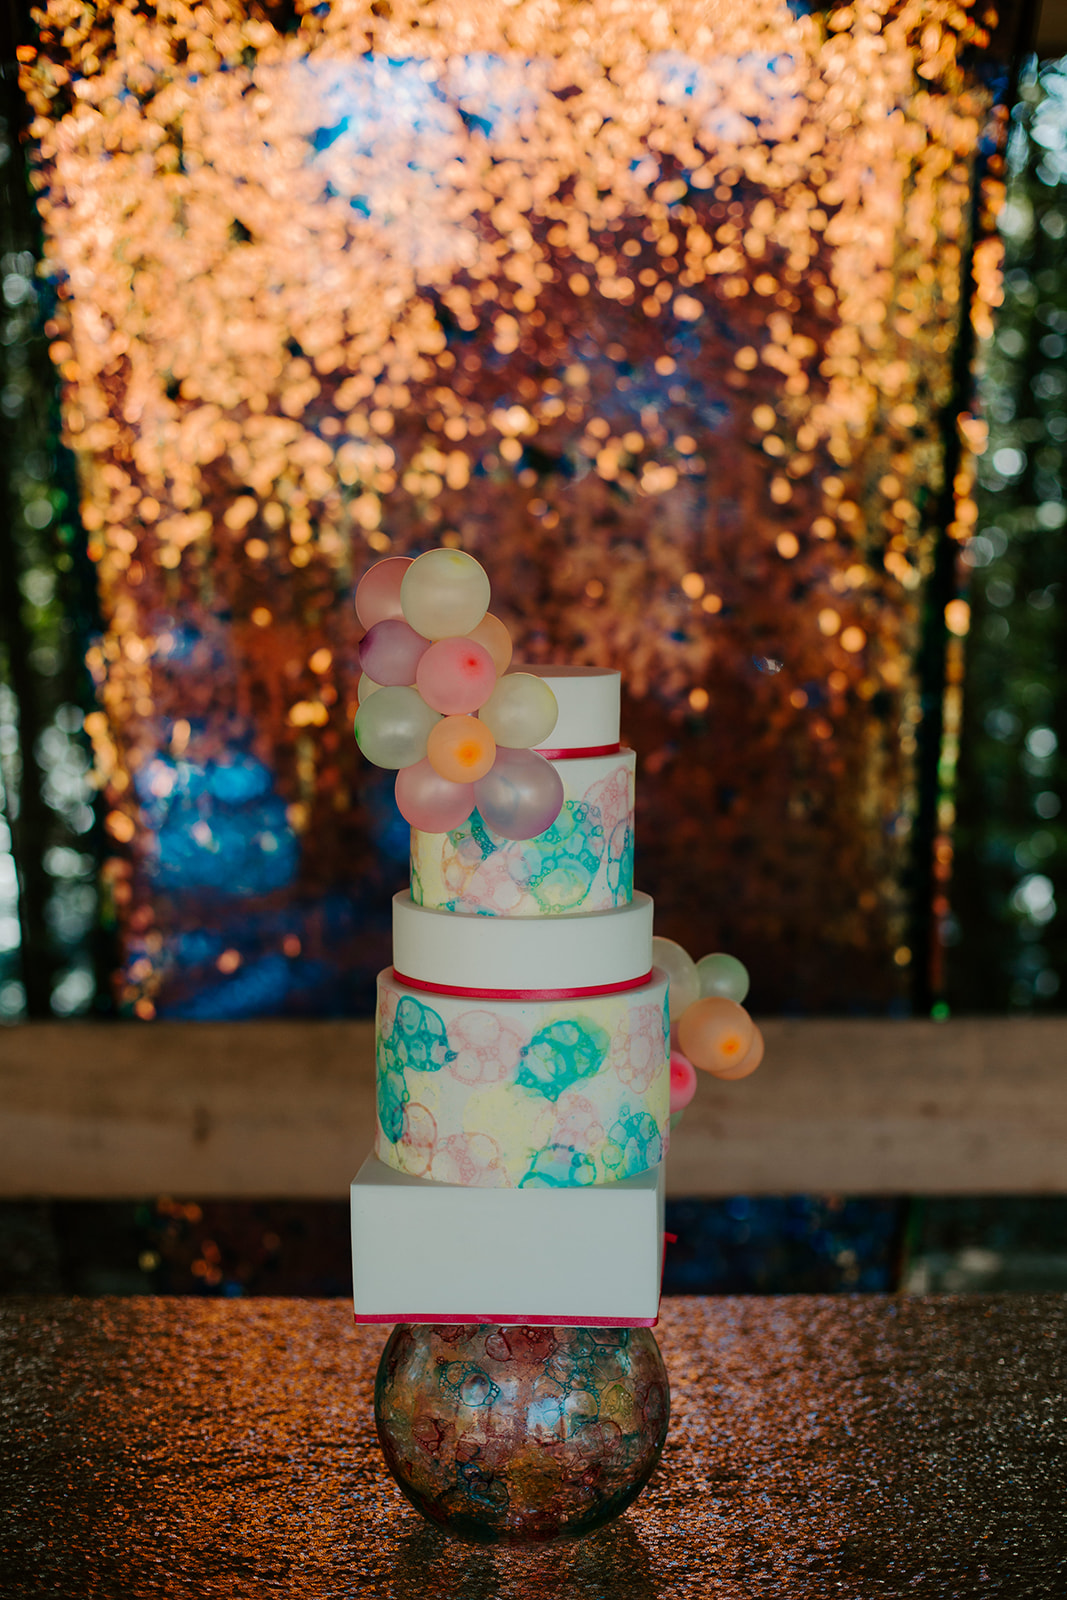 colourful wedding cake - fun wedding cake -geometric wedding cake - bubble wedding cake - unique wedding cake